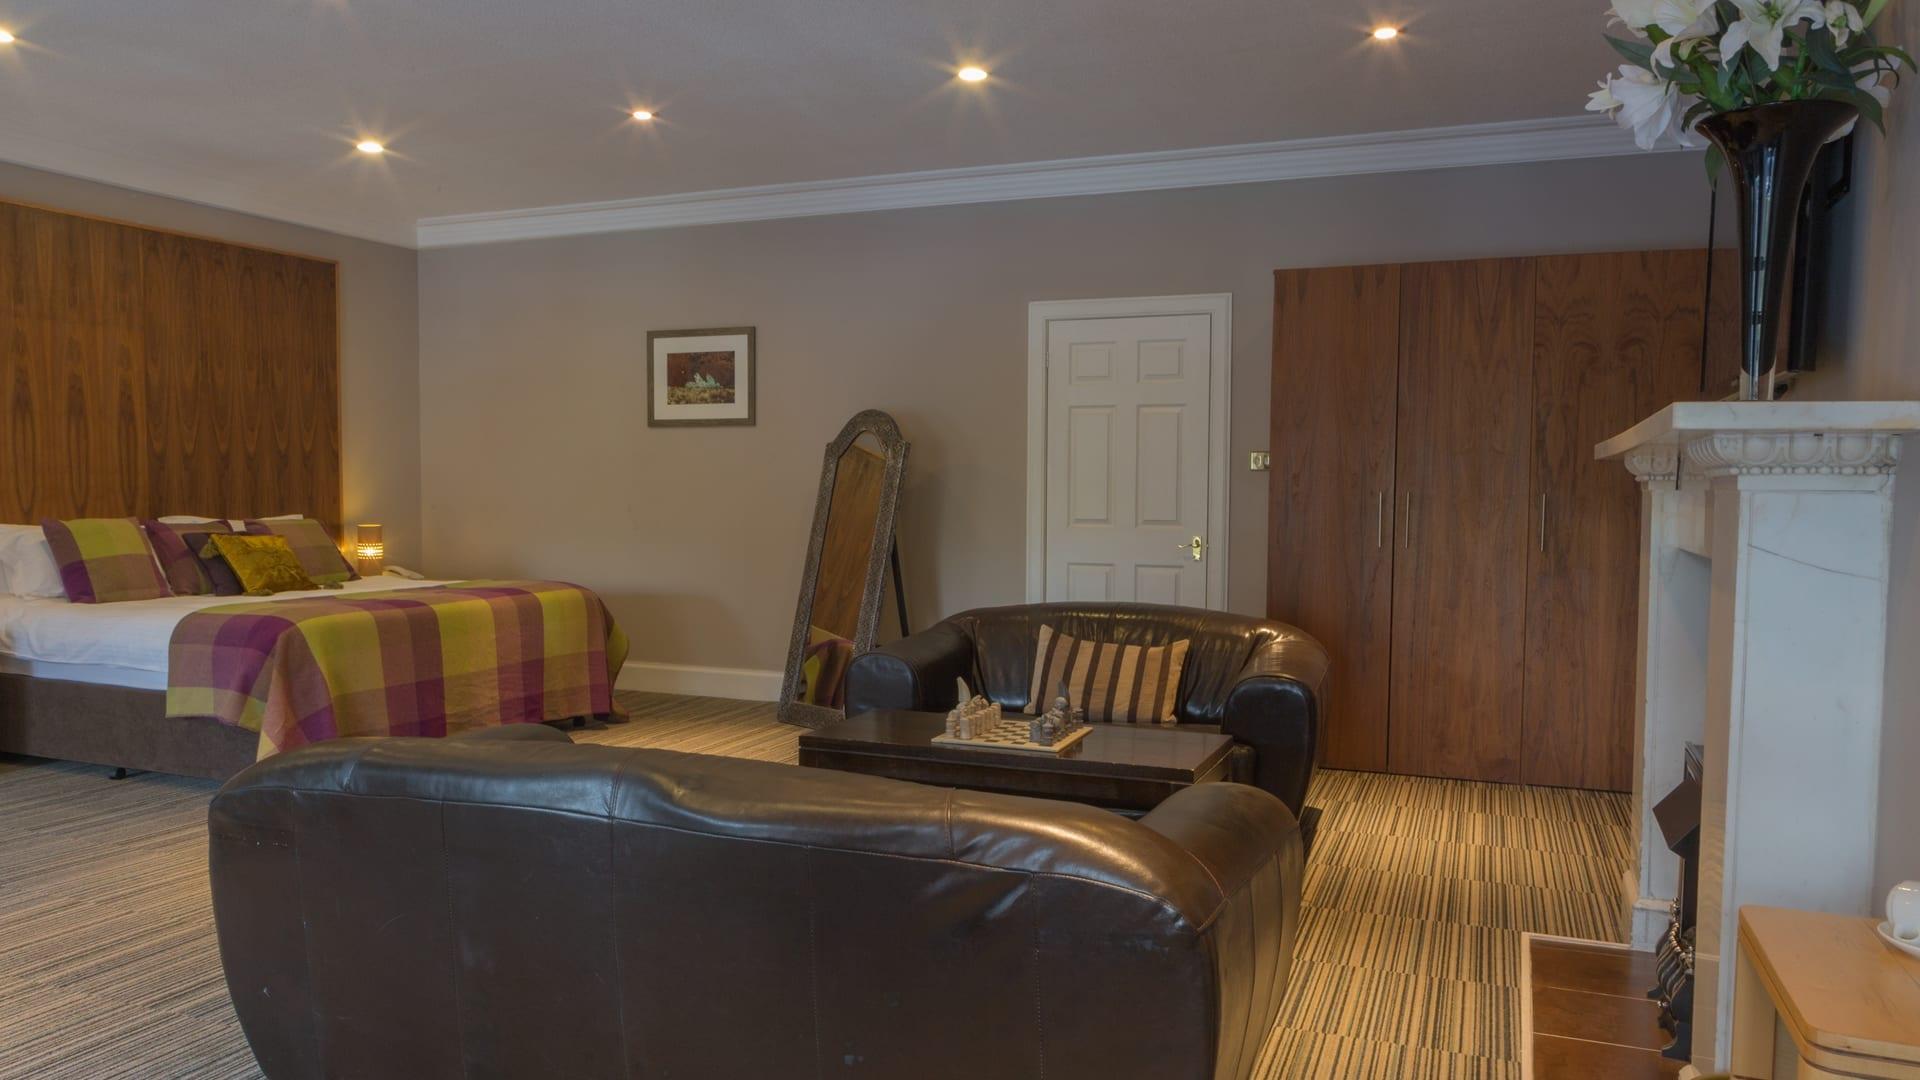 The Eddleston Suite at Barony Castle